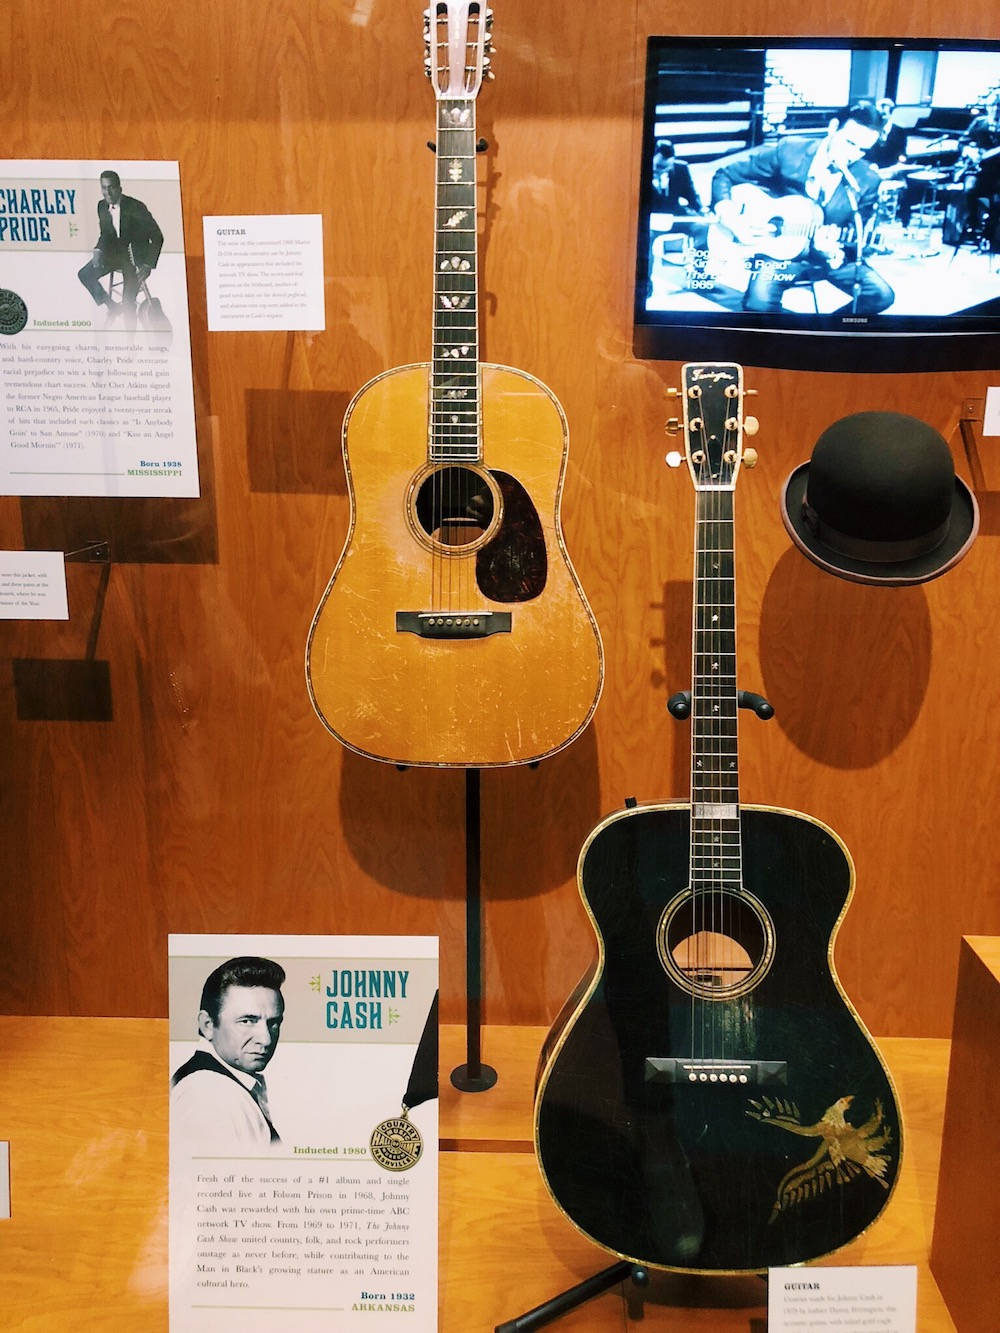 Johnny Cash guitars at CMHF